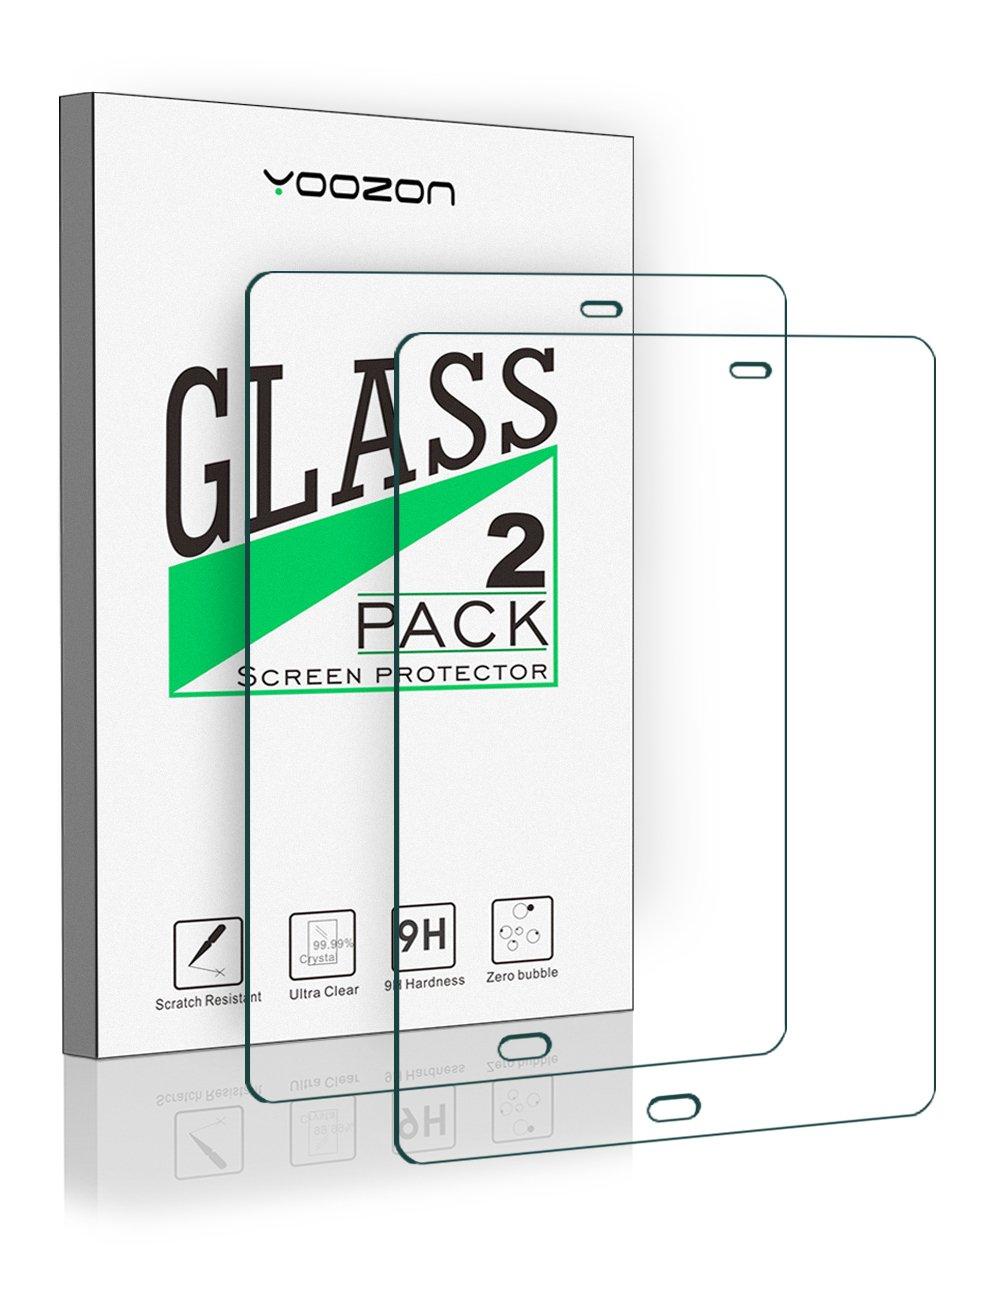 Galaxy Tab S3 Screen Protector [2 Pack],Yoozon Samsung Galaxy Tab S3 9.7 Tempered Glass Screen Protector for Galaxy Tab S3 (9.7 Inch, SM-T820 T825)